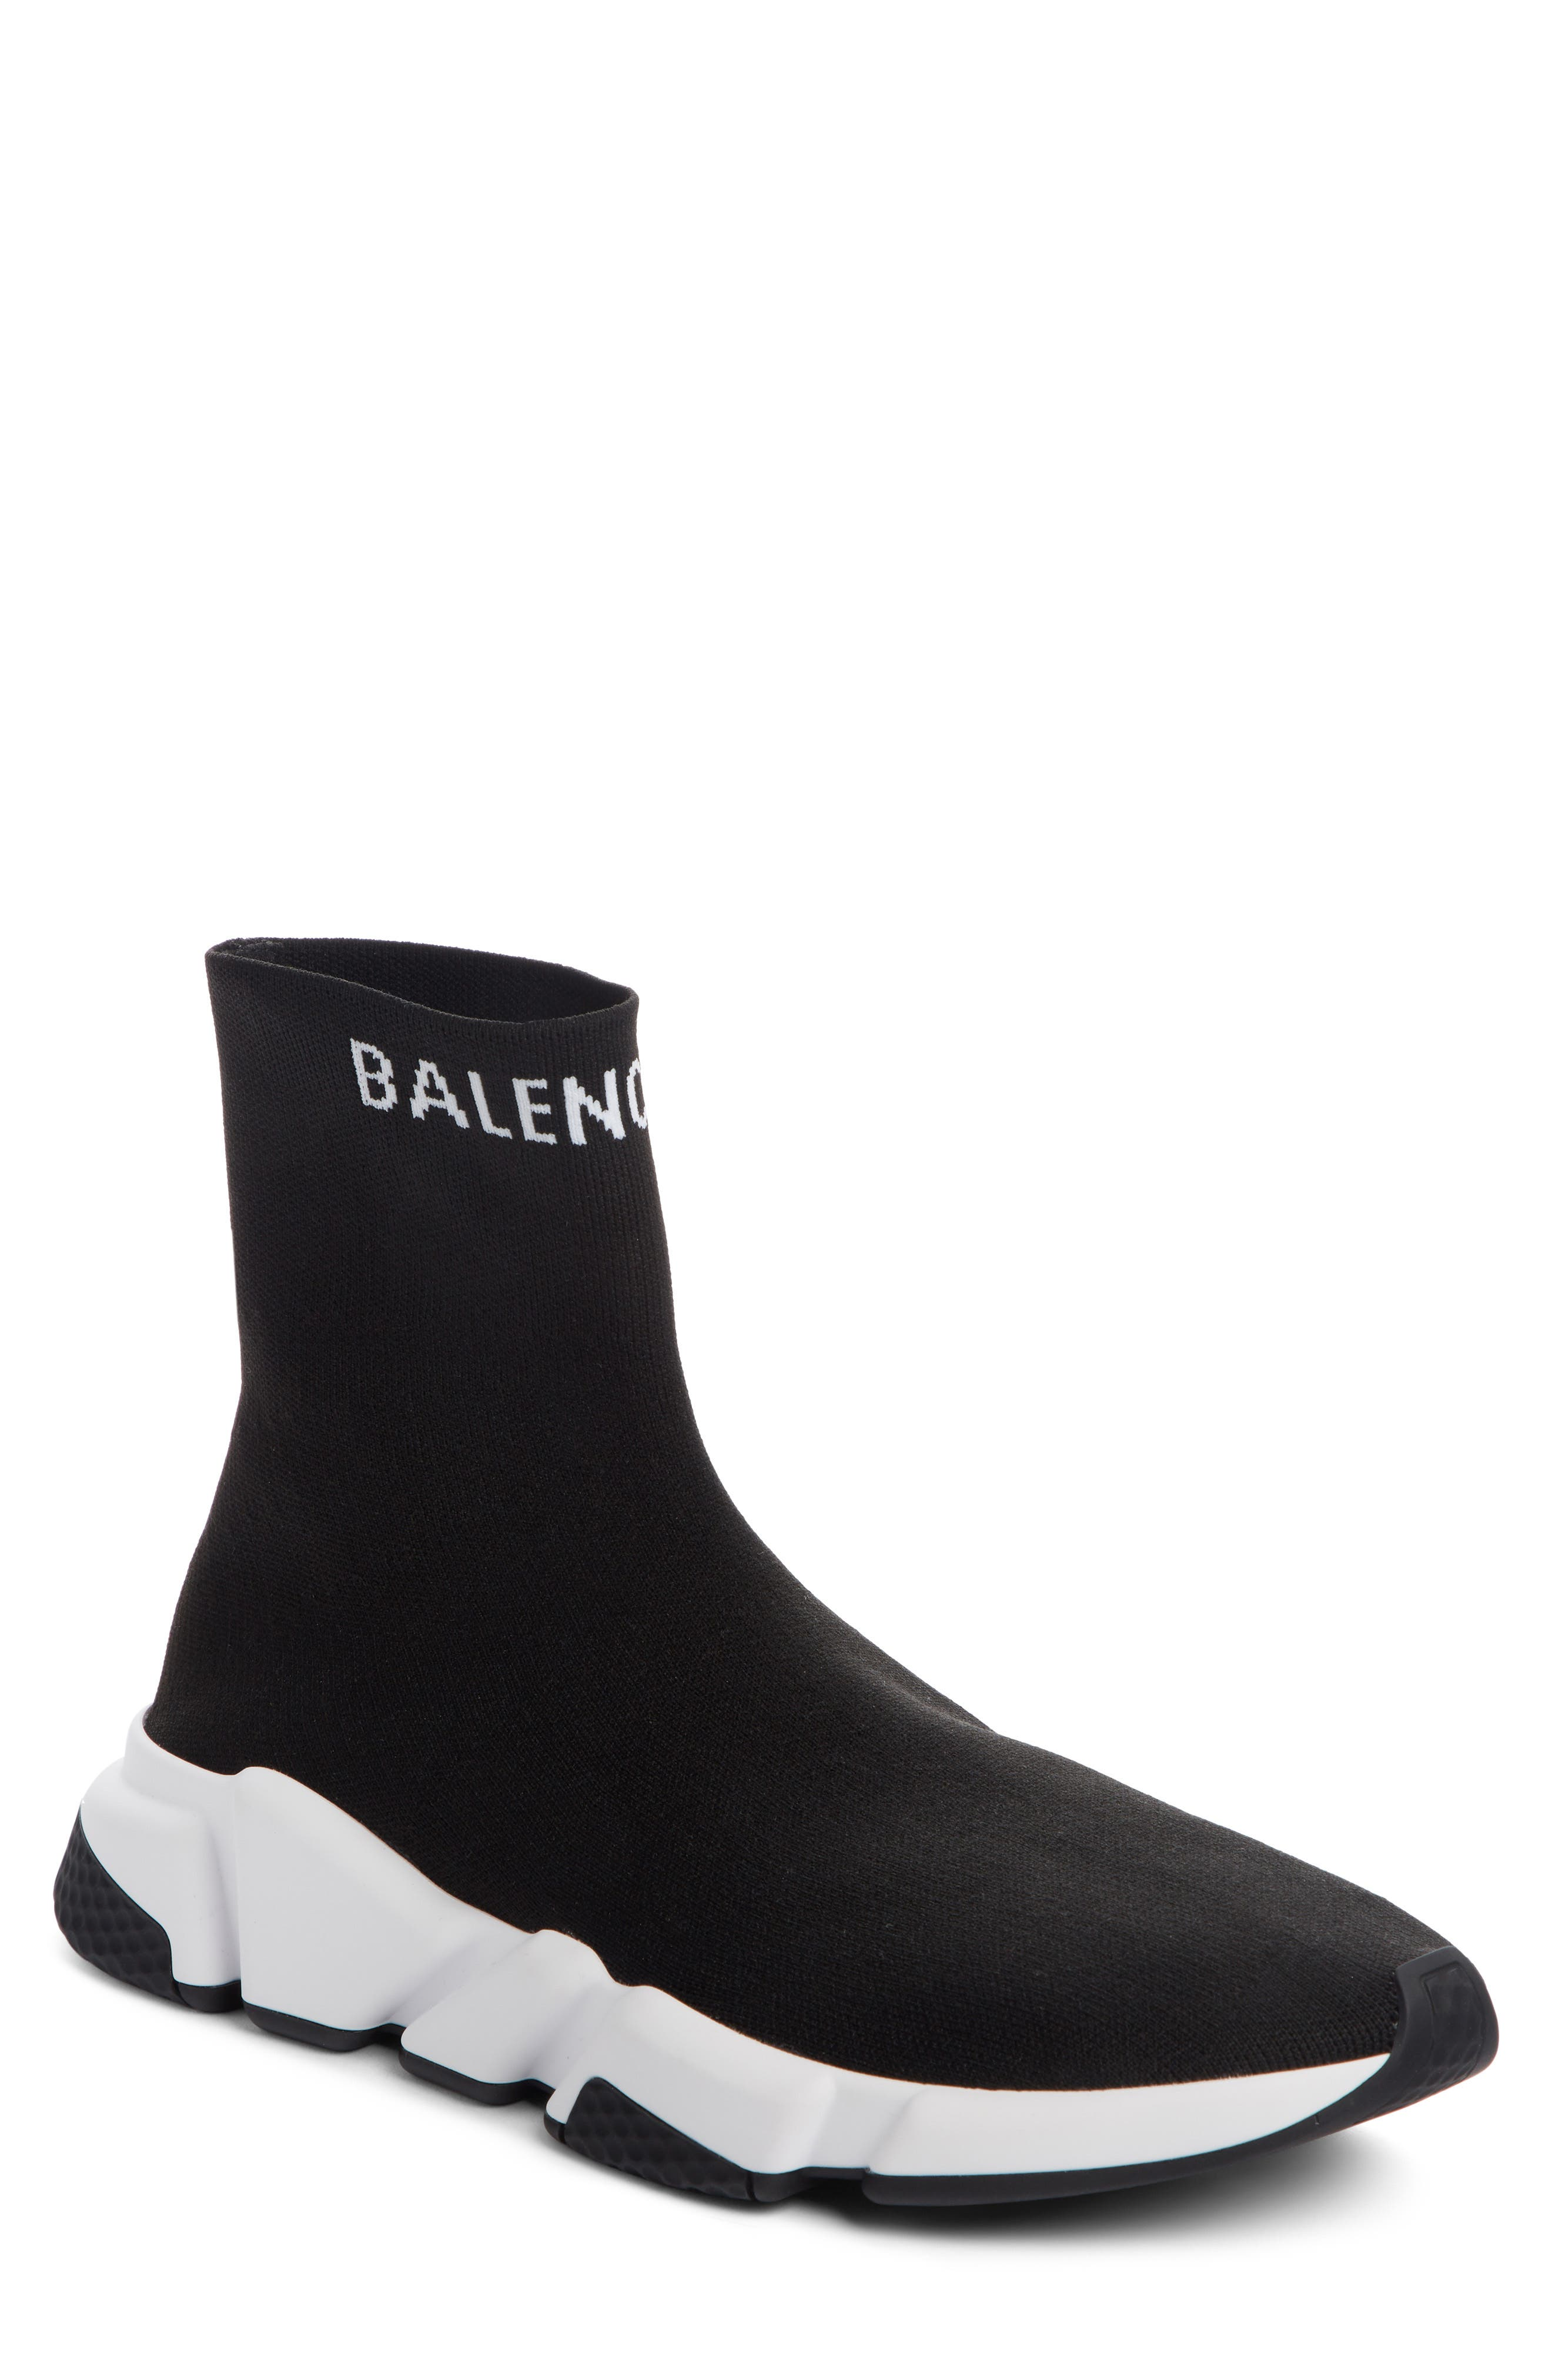 BALENCIAGA, Speed Sock Slip-On, Main thumbnail 1, color, BLACK/ WHITE